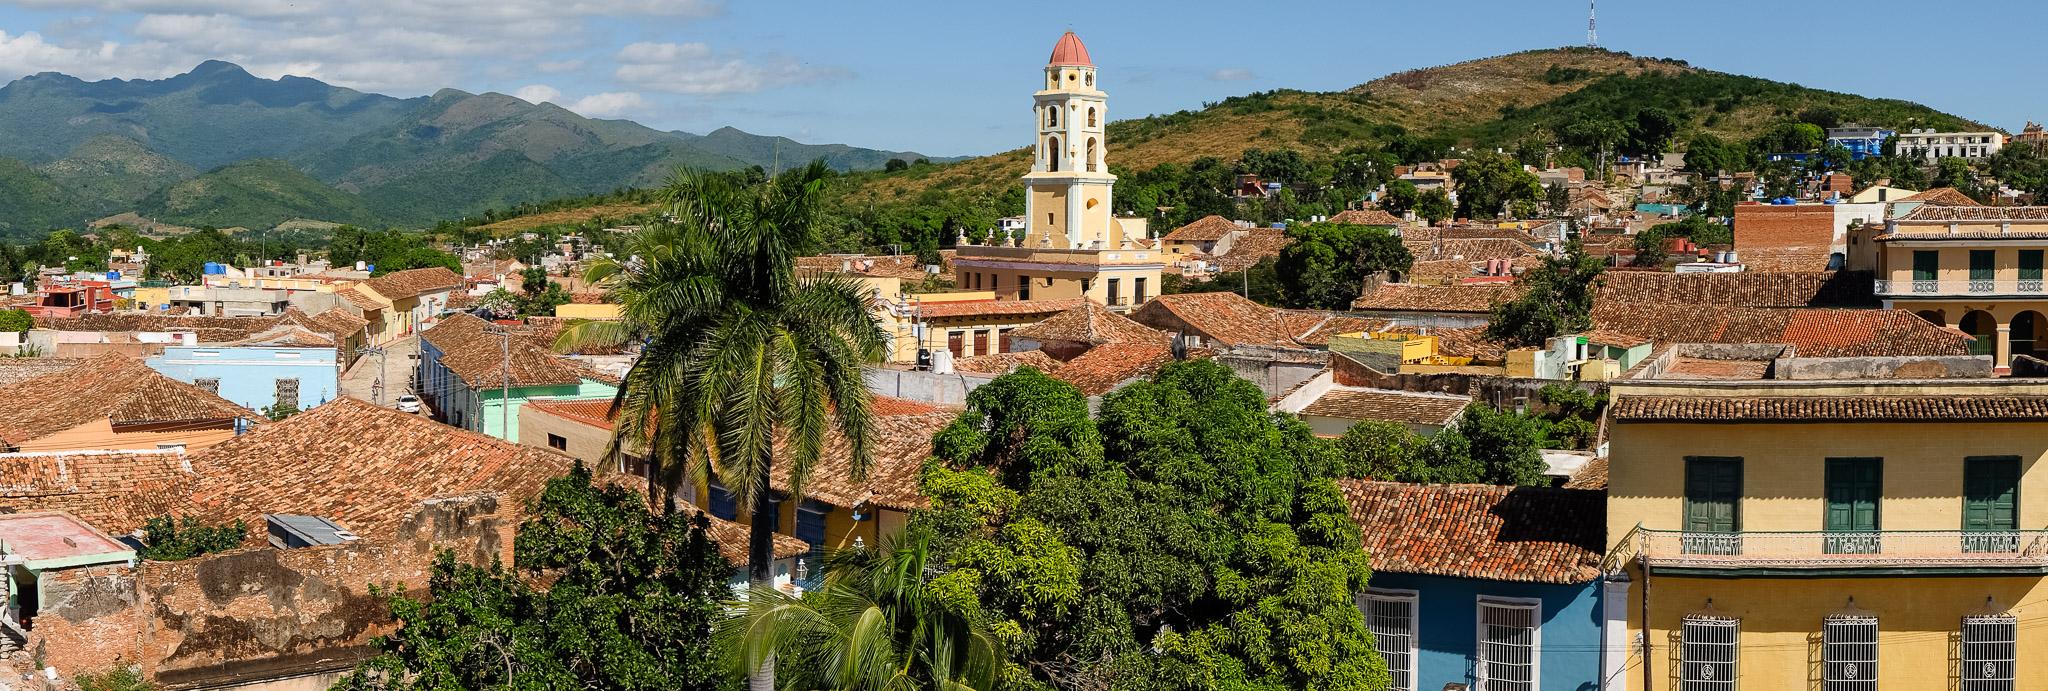 Cuba-2017-12-Trinidad-0093.jpg